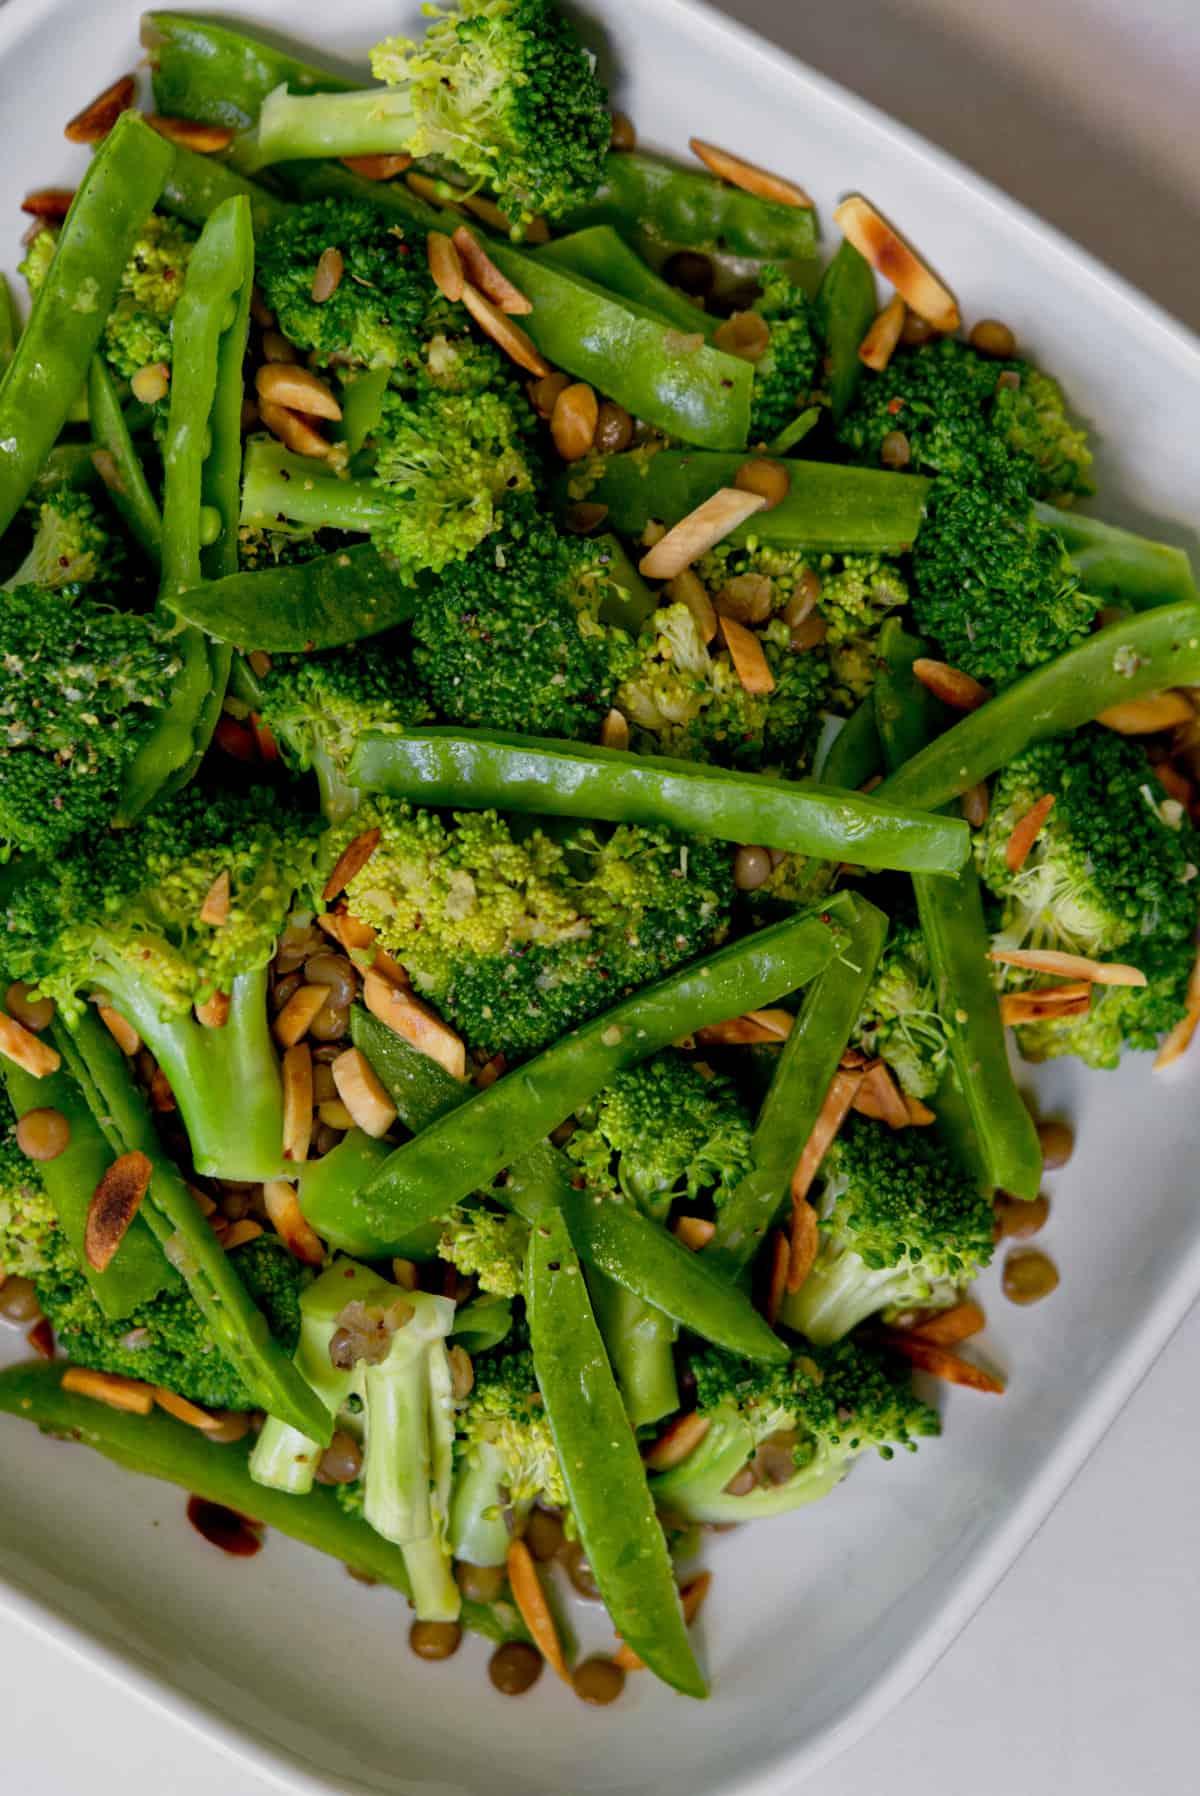 top view of broccoli salad